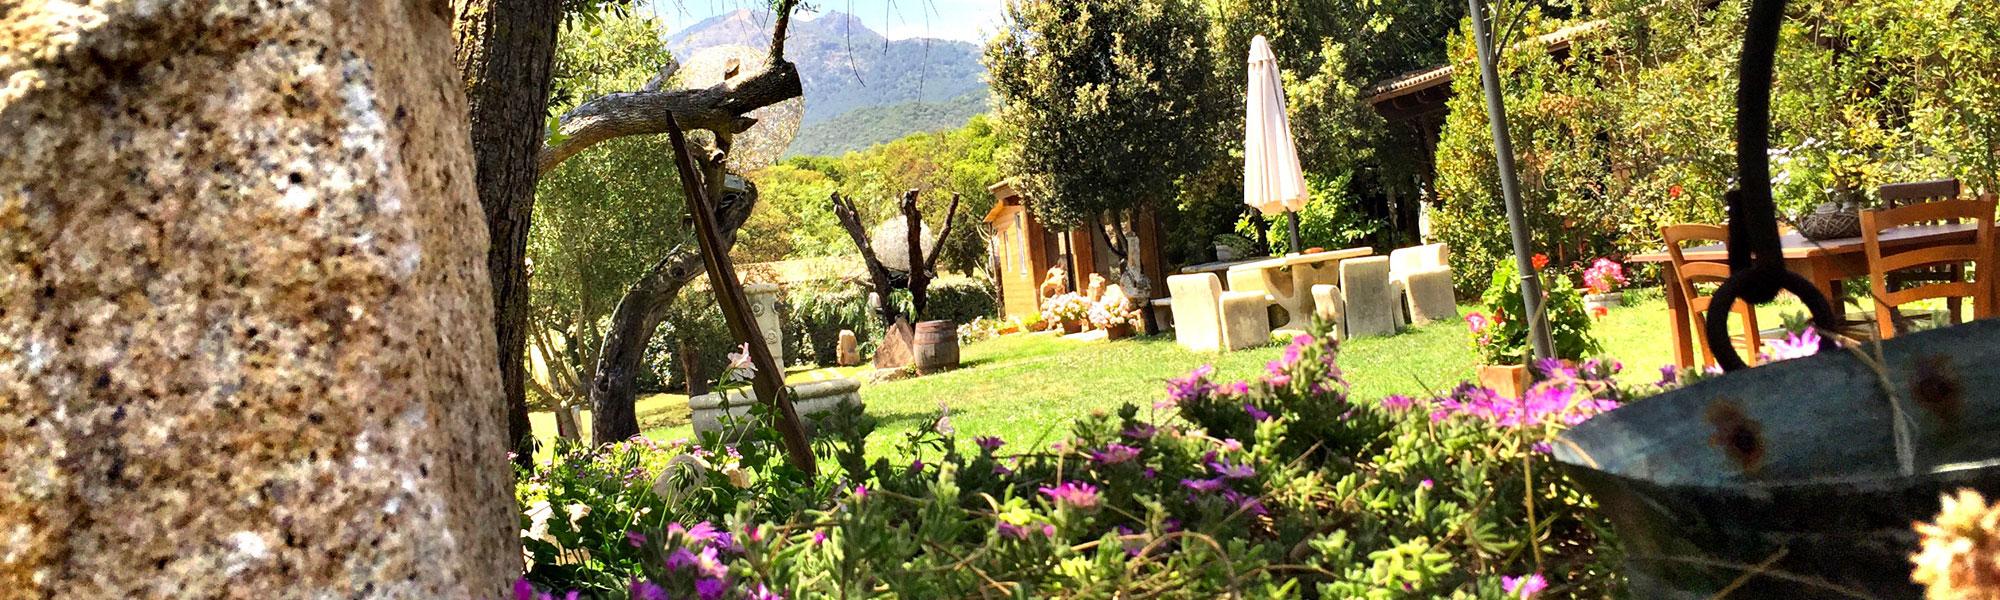 Agriturismo Boltei Padru Sardegna